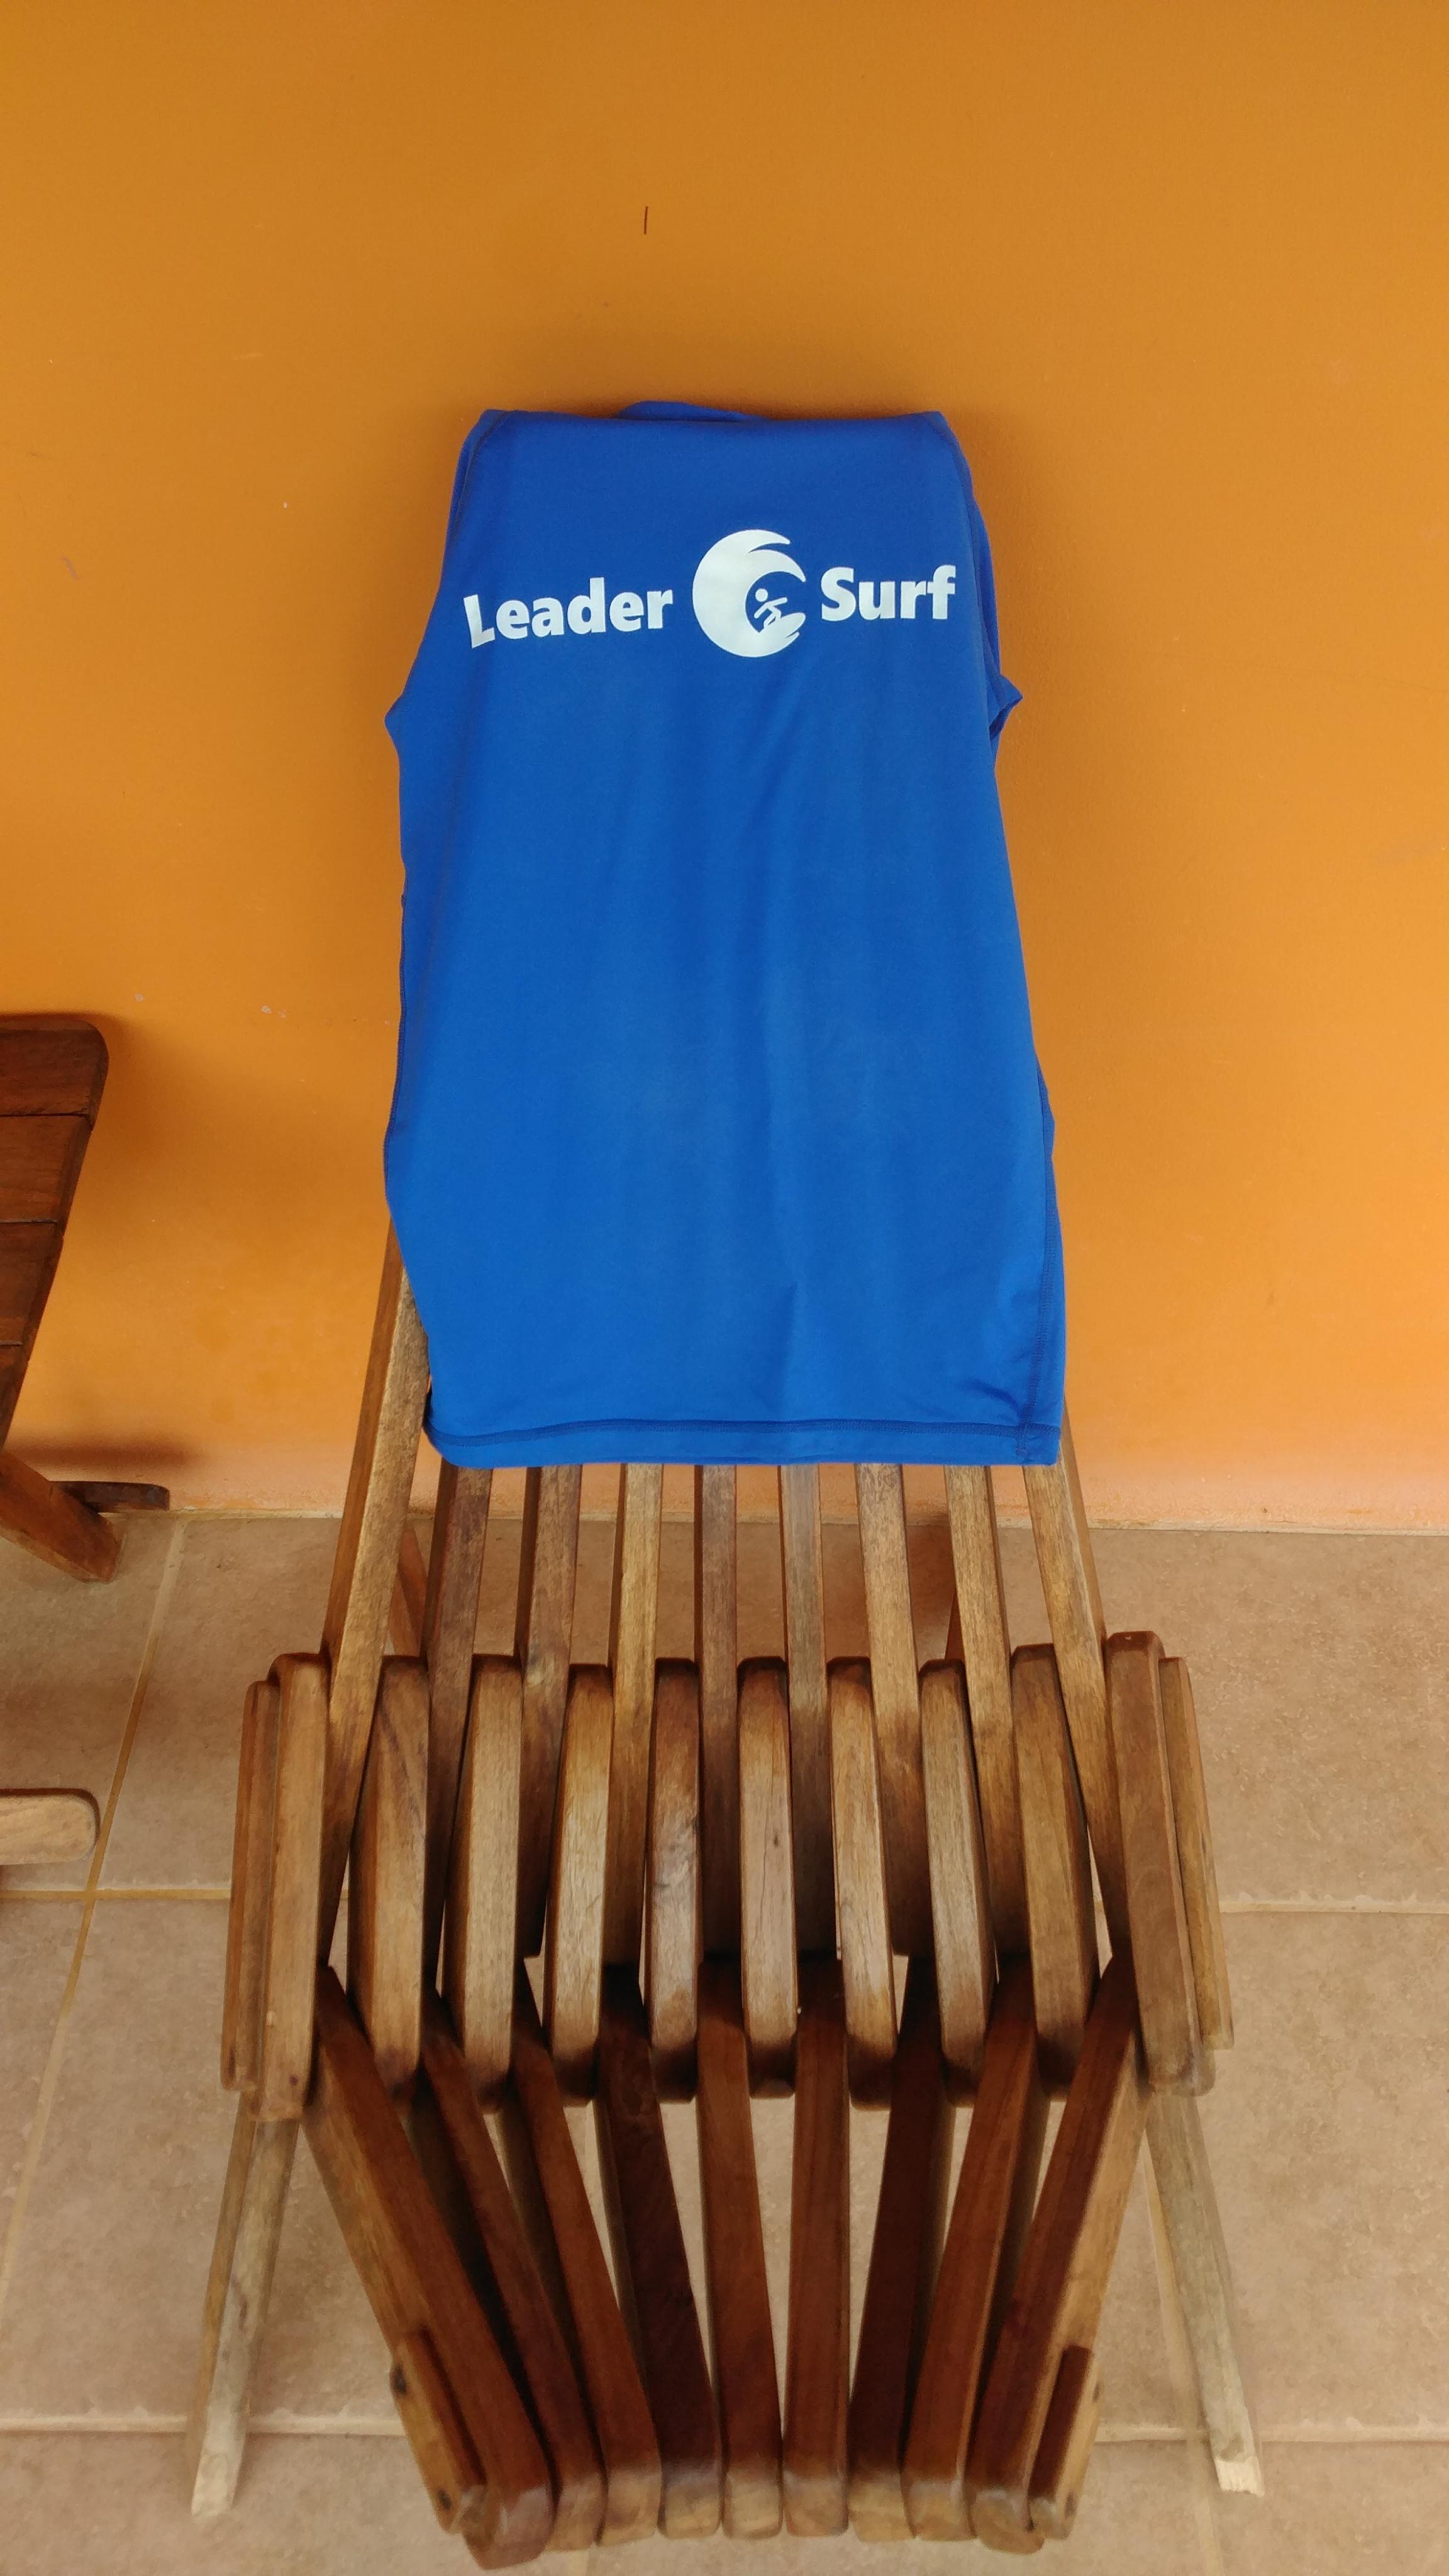 LeaderSurf shirt on chair